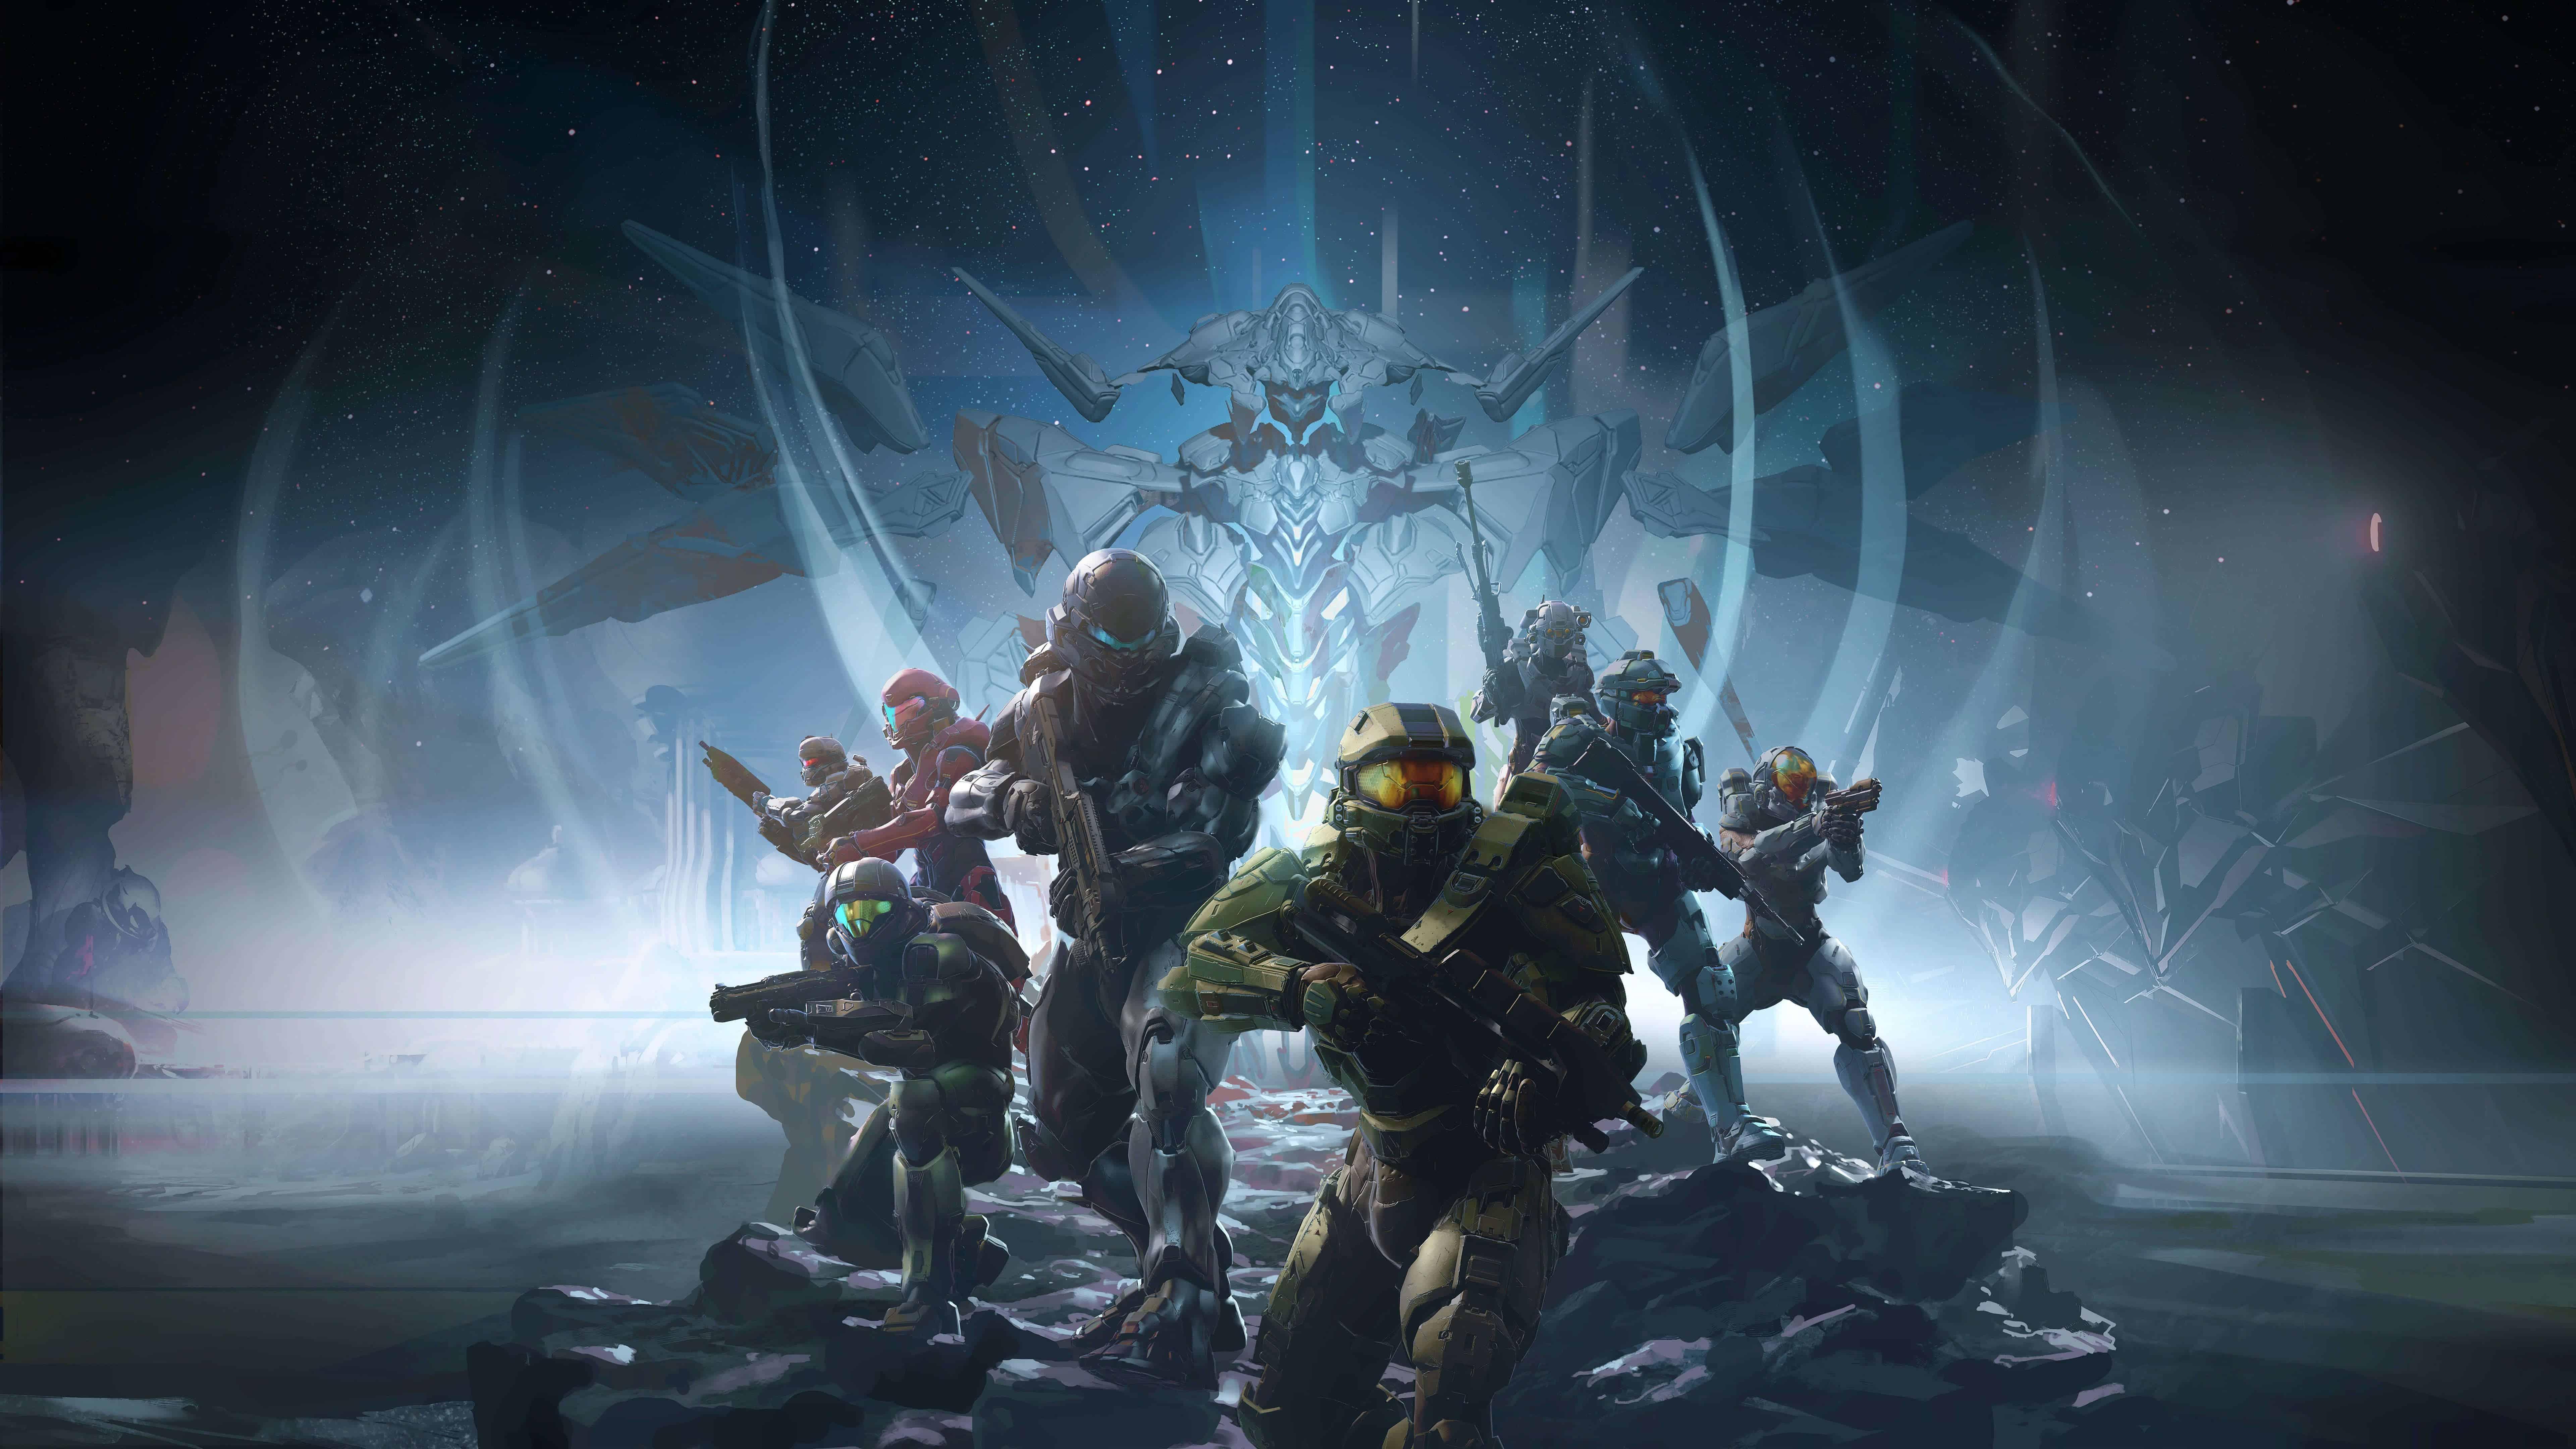 Halo 5 Guardians Wallpaper: Halo 5 Guardians UHD 8K Wallpaper